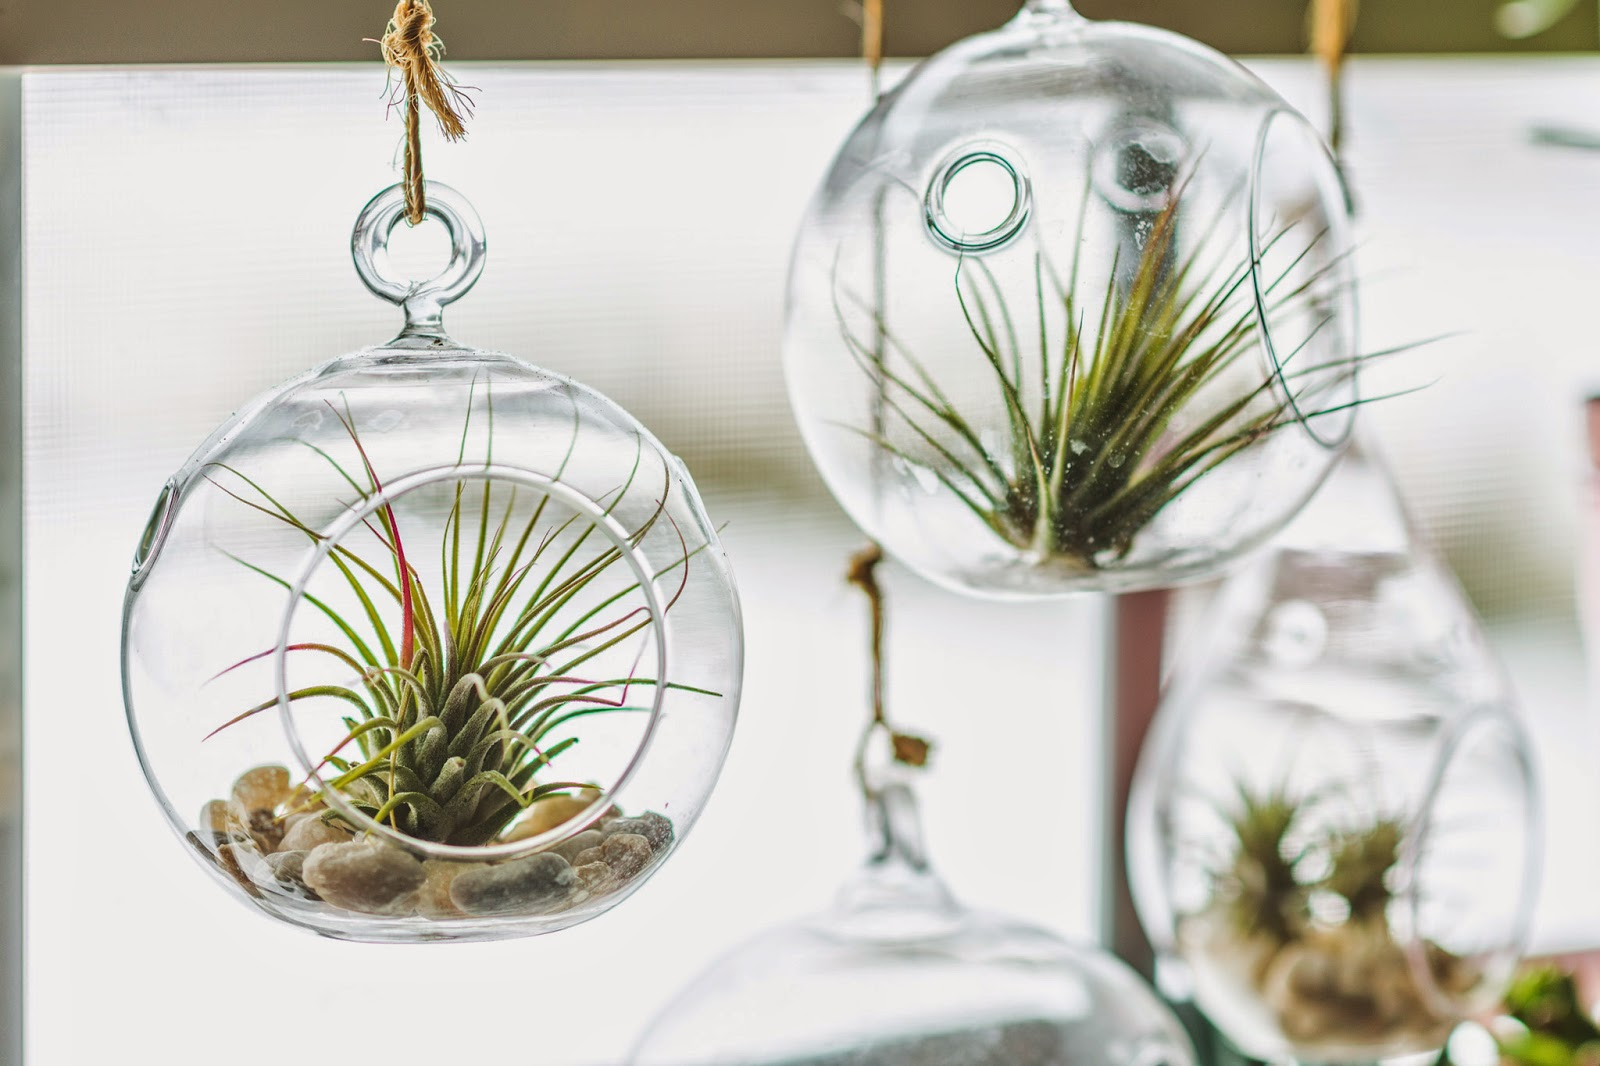 plants0025.jpg